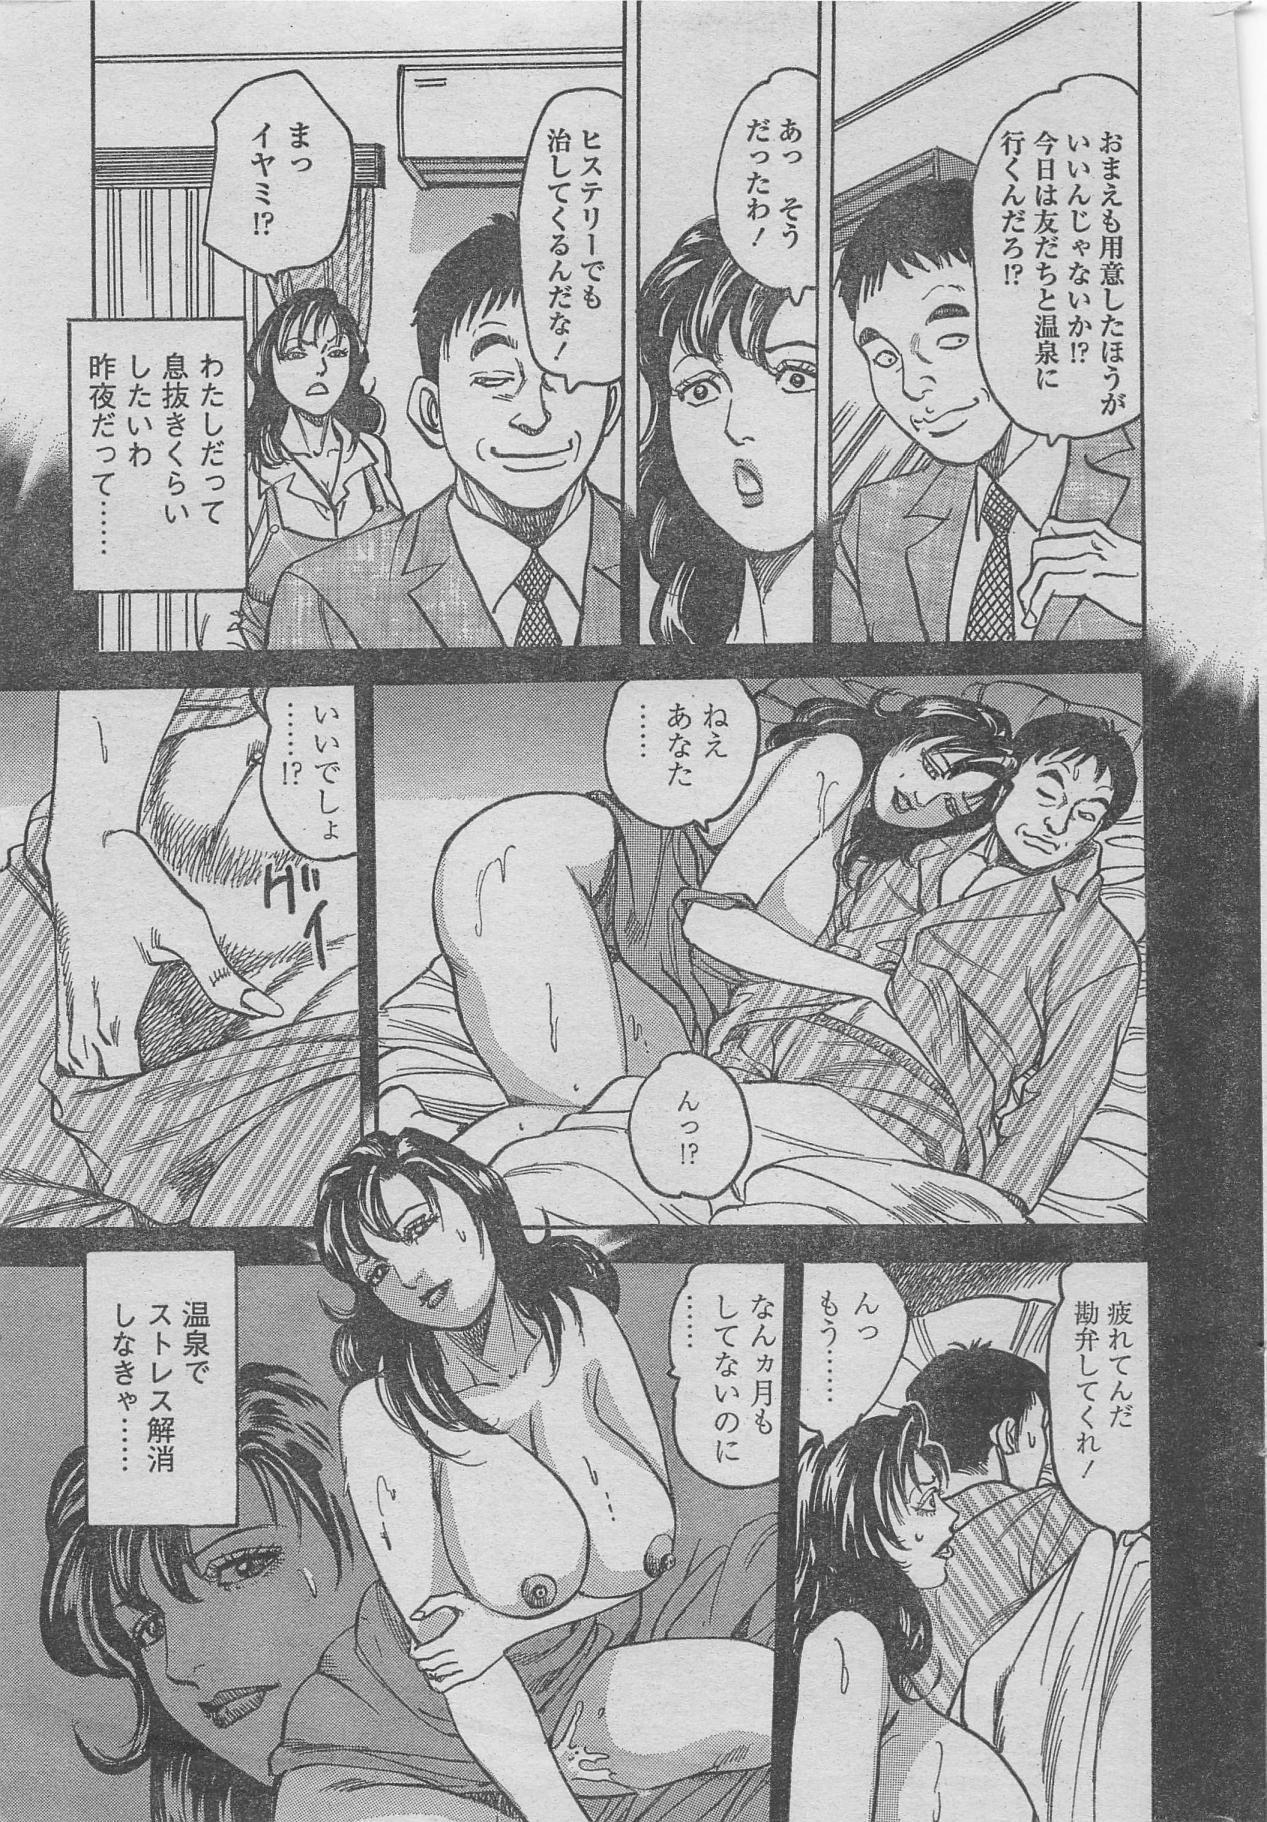 Manga Lawrence 2013-04 26